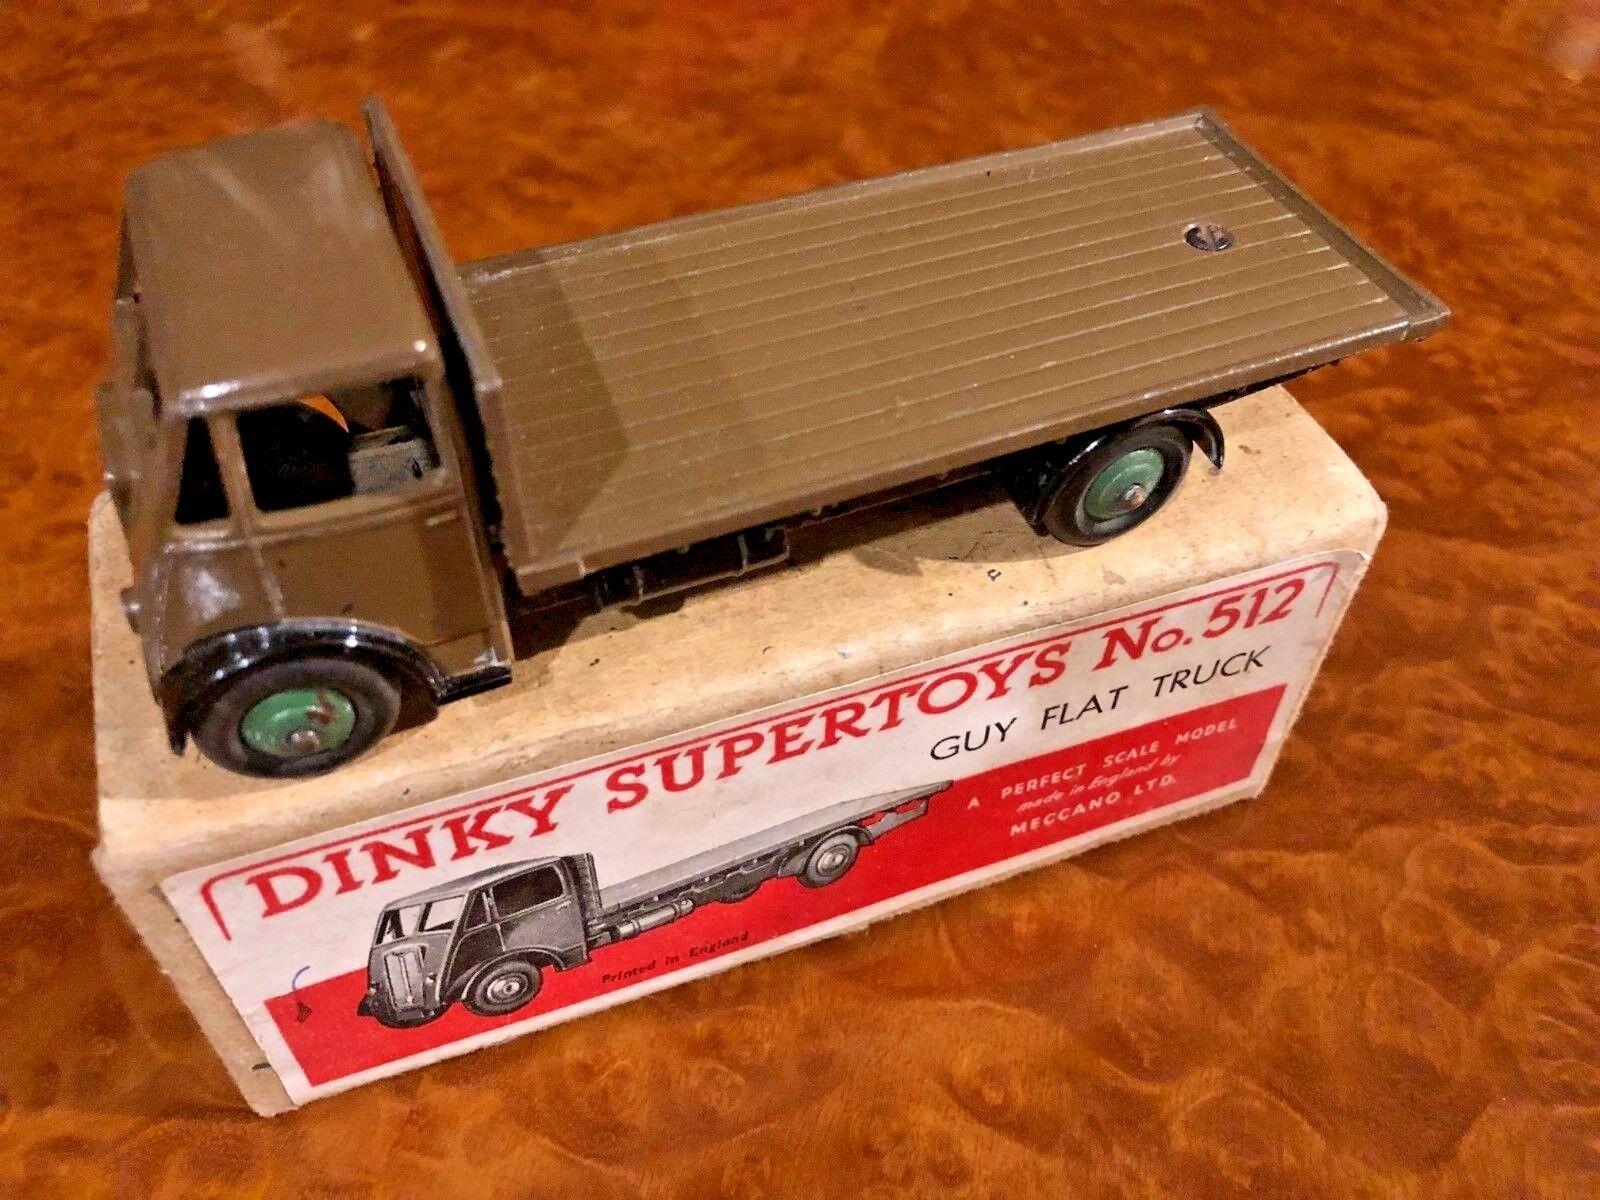 Vintage Dinky Supertoys MIB Guy Lit Plat Rare Couleur N0. 512